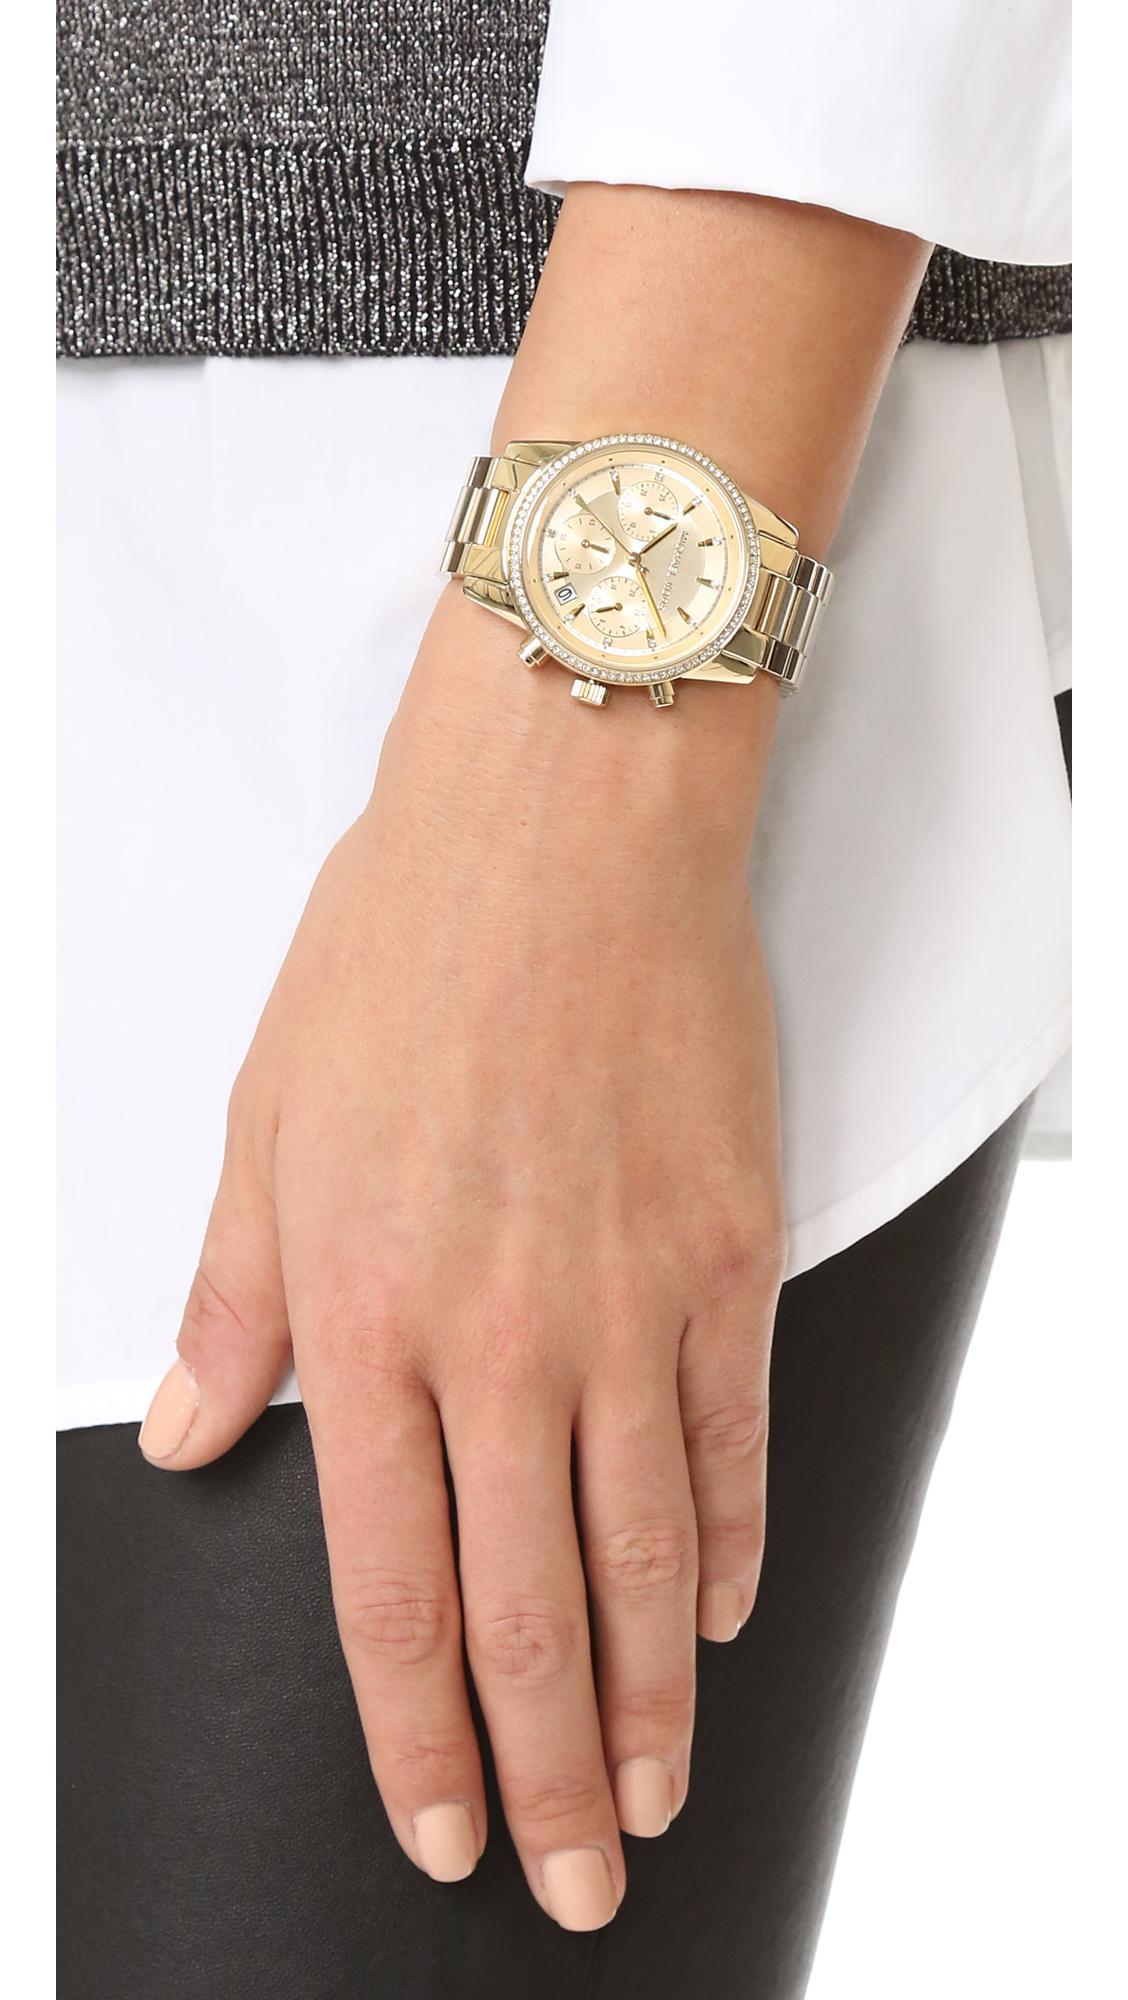 0dfdd3a88 Michael Kors Ritz Watch in Metallic - Lyst